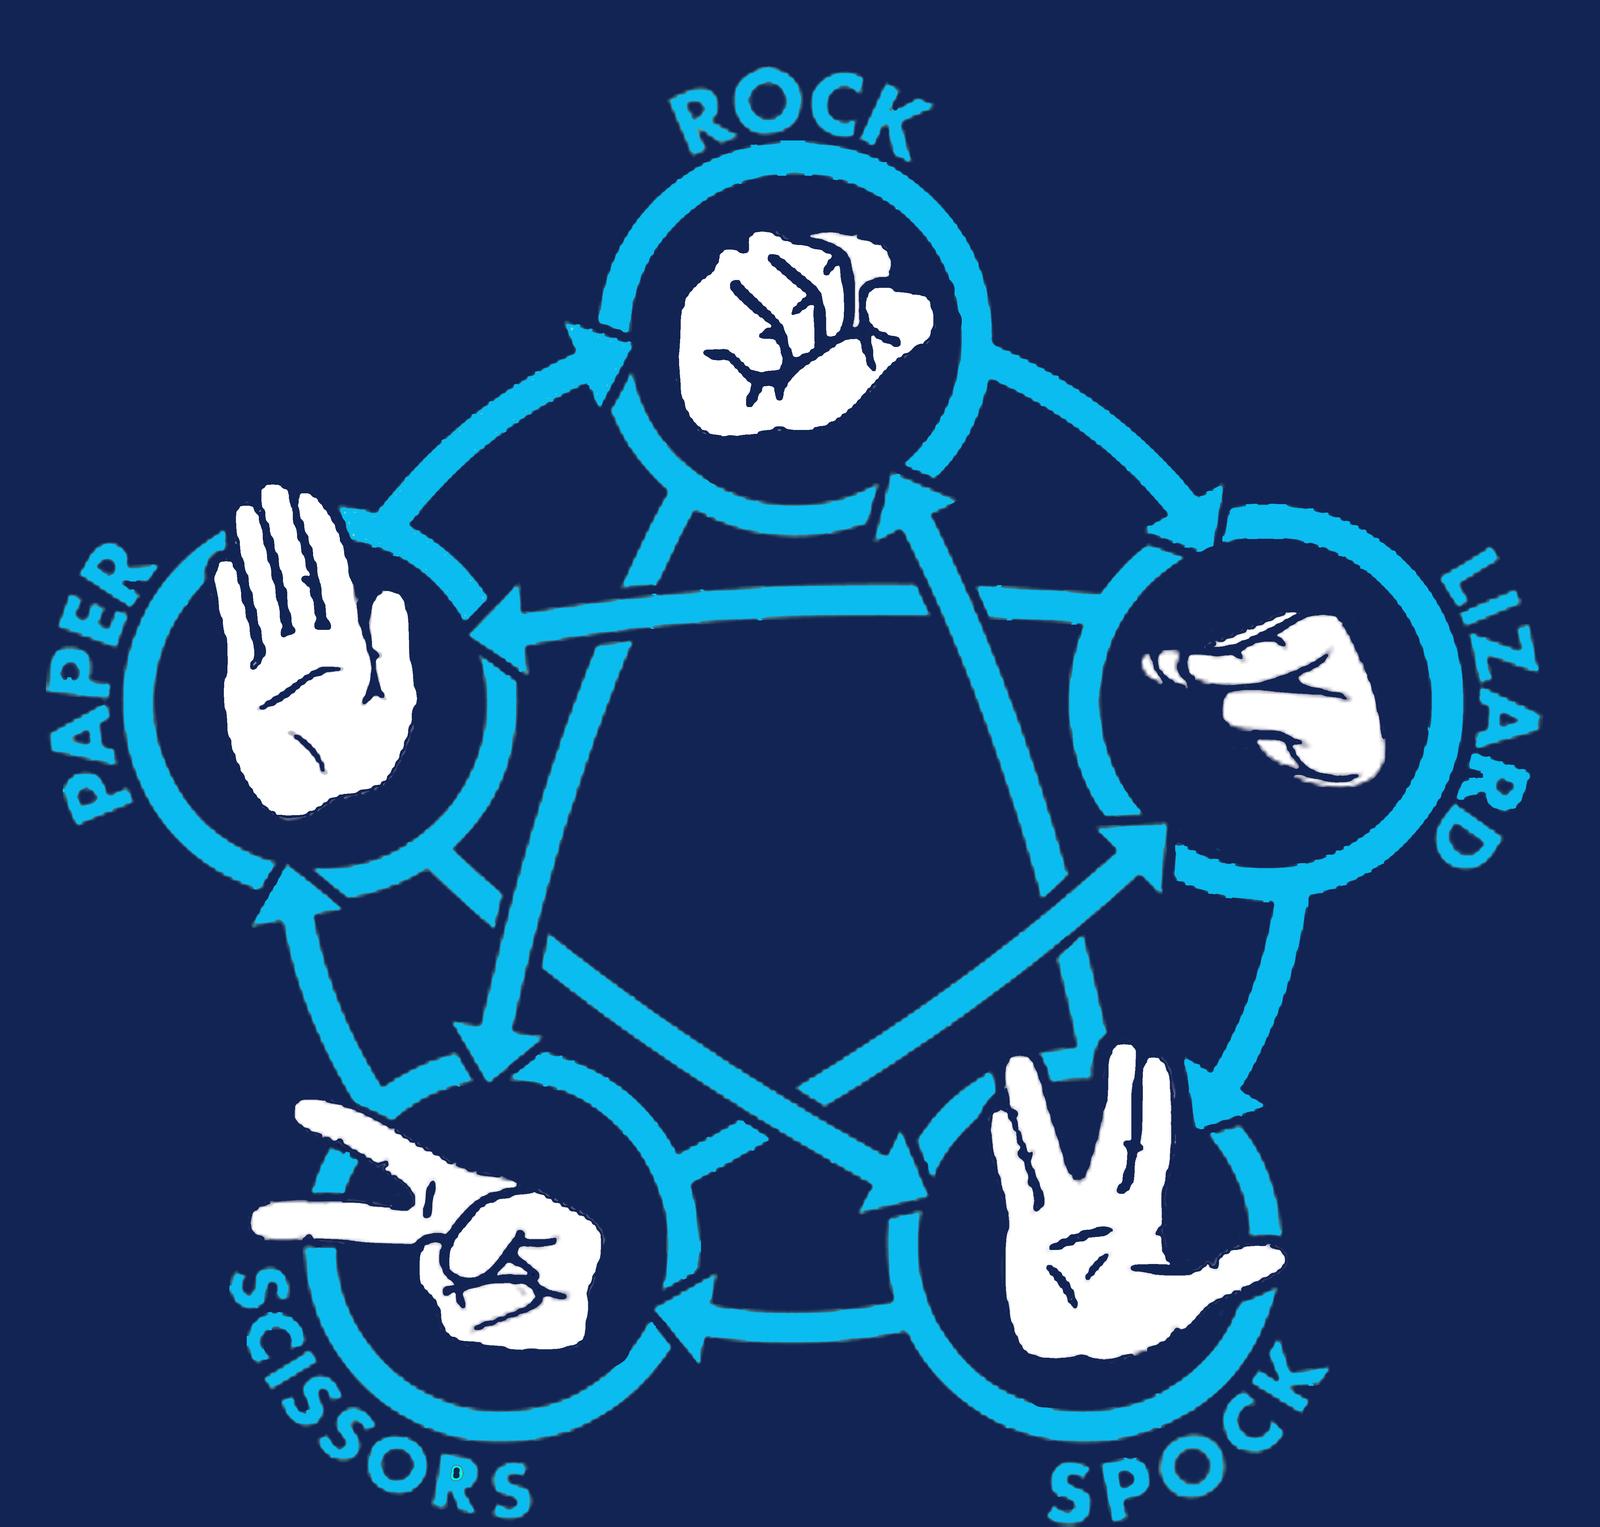 big bang theory rock paper scissors lizard spock Rock paper scissors lizard spock big bang theory badges, rock paper scissors lizard spock rules, rock paper scissors badge sheldon cooper theartfulbadgeruk $ 200.